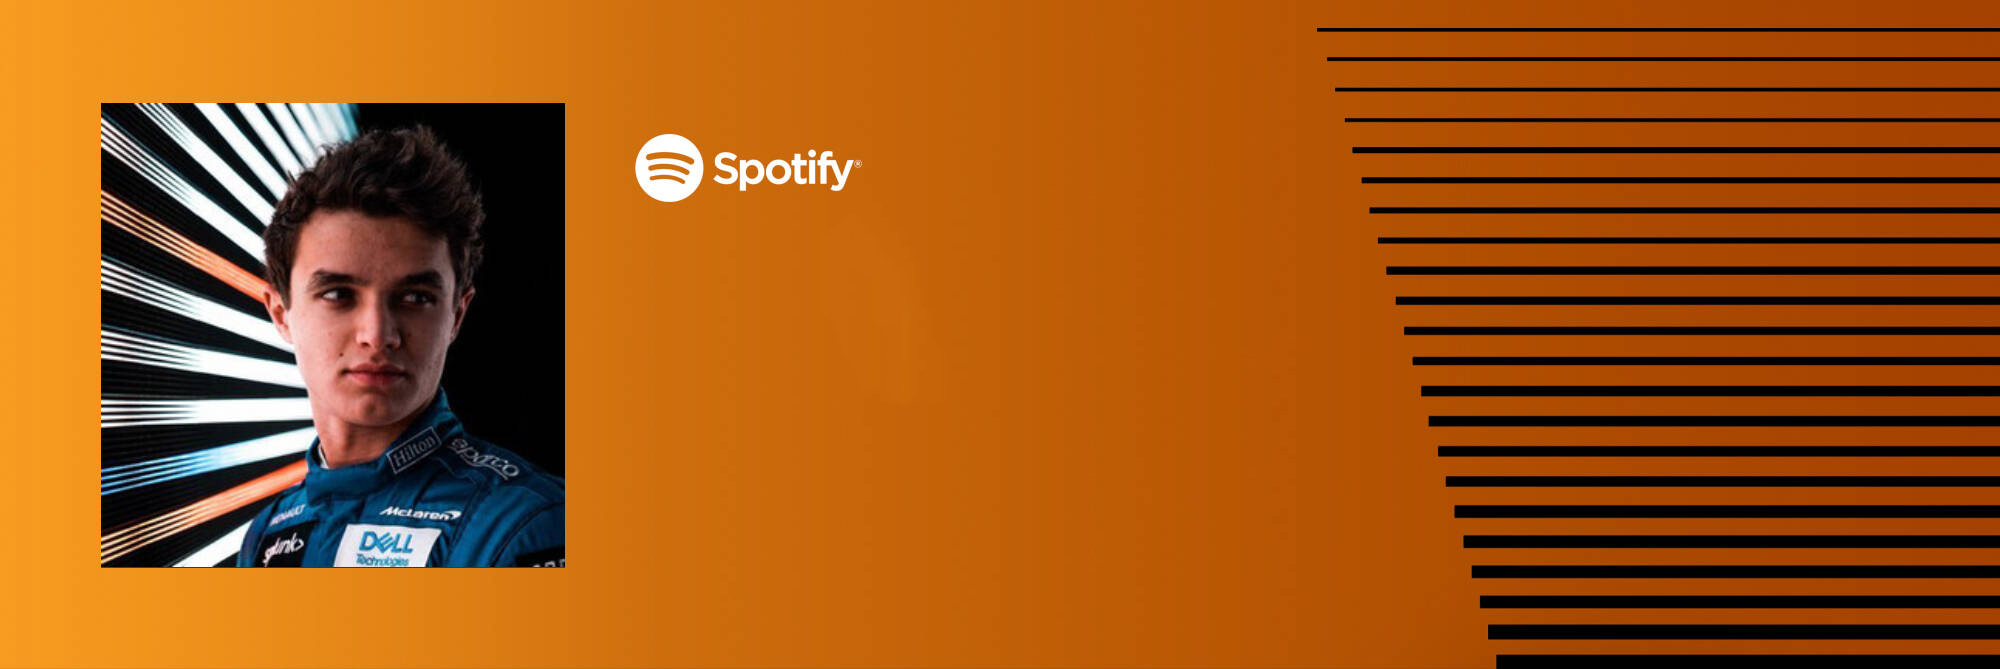 Lando Norris Spotify Playlist Graphic Desktop